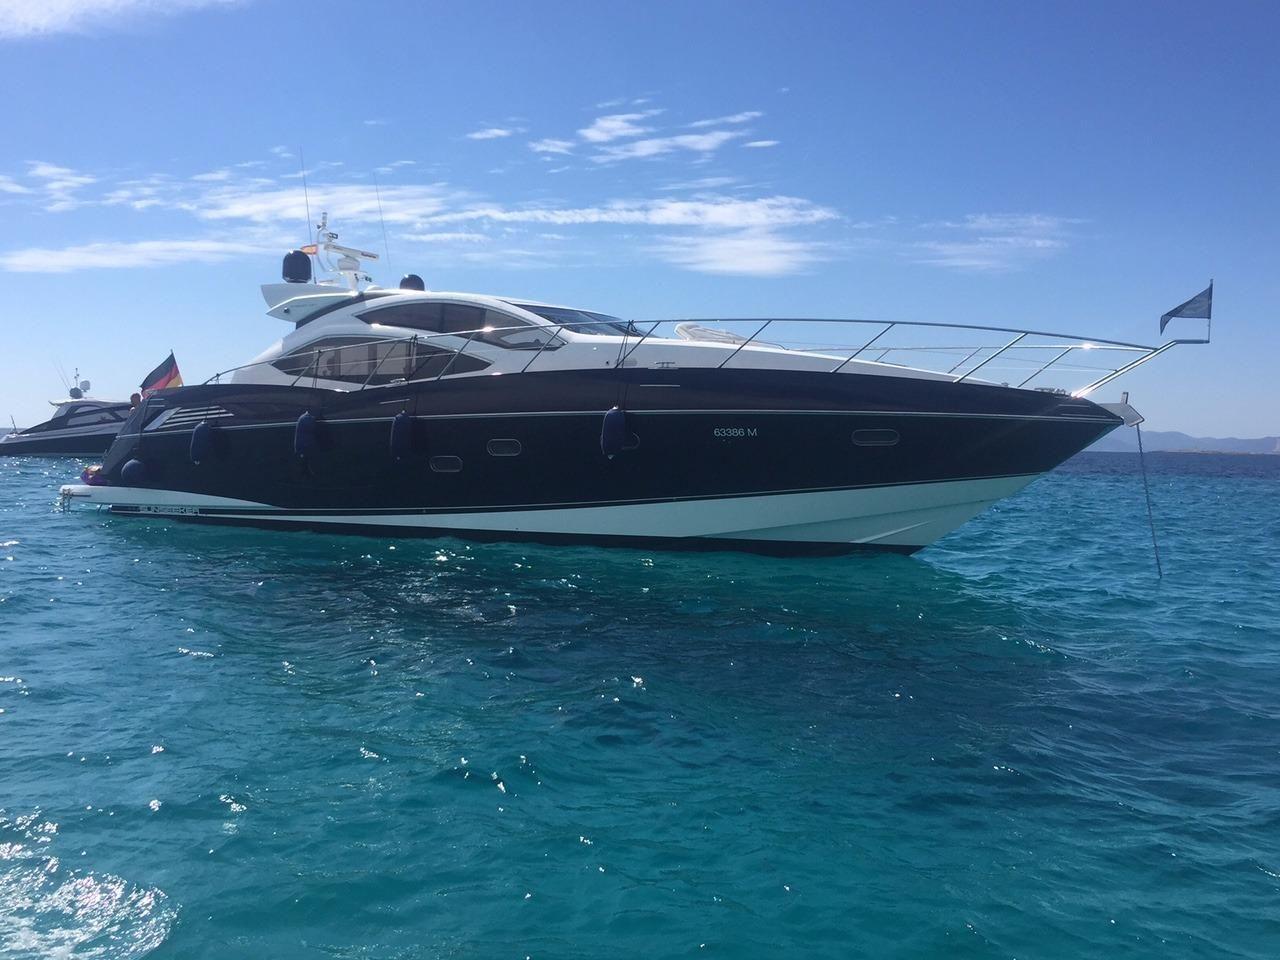 2011 sunseeker predator 64 power boat for sale www. Black Bedroom Furniture Sets. Home Design Ideas